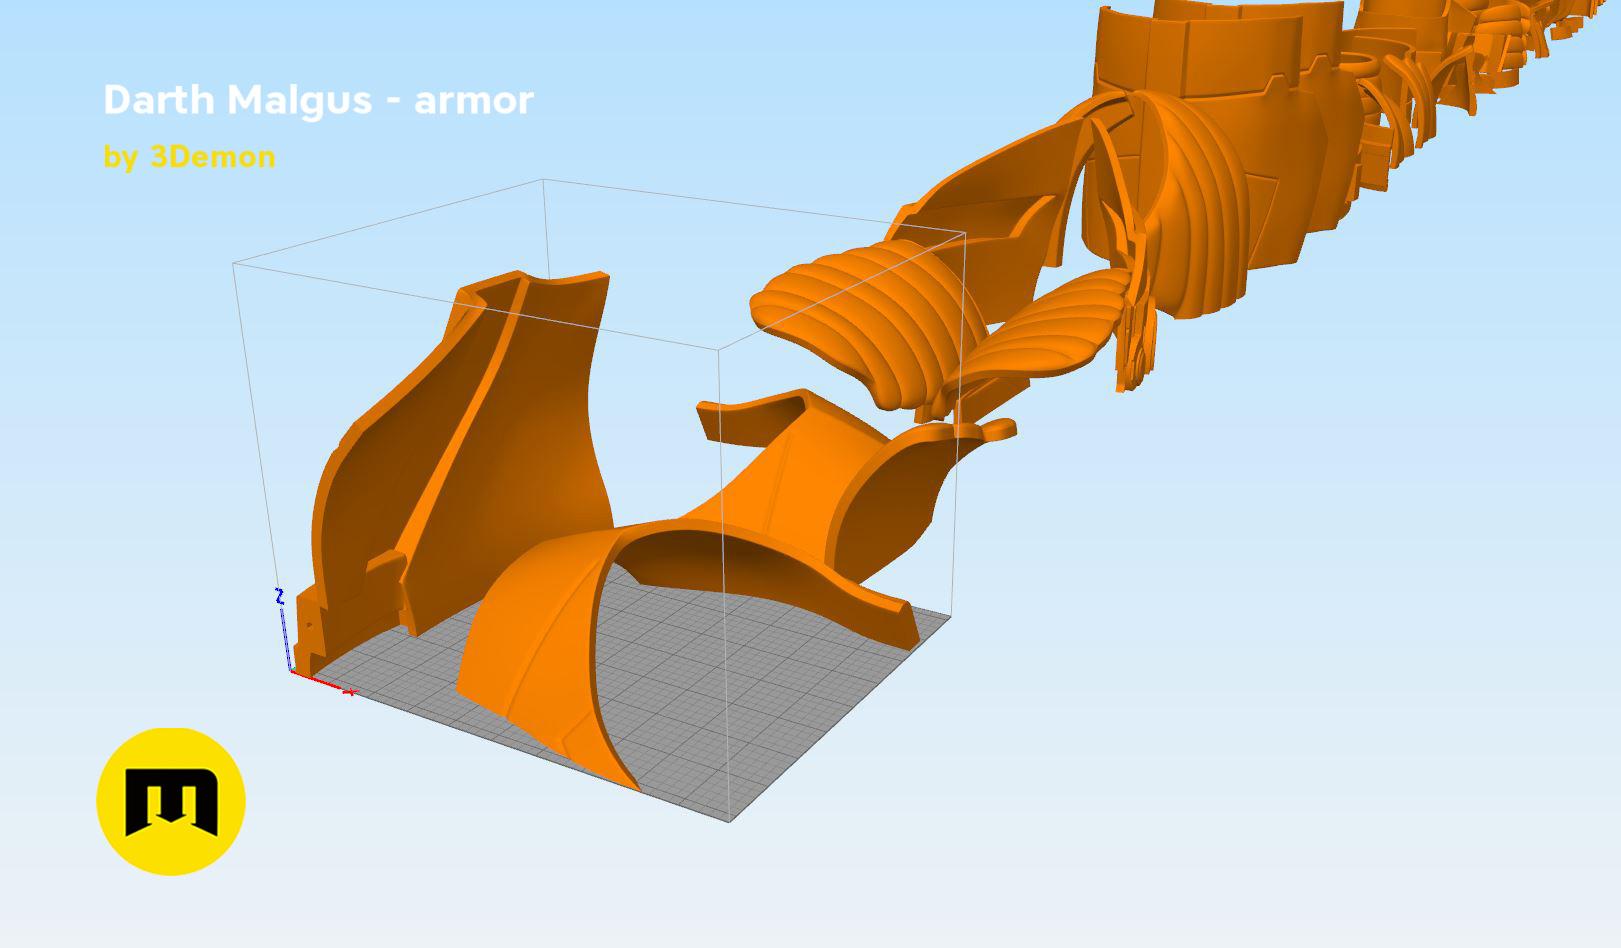 Darth-malgus-parts.jpg Download STL file Darth Malgus's full size armor • Design to 3D print, 3D-mon